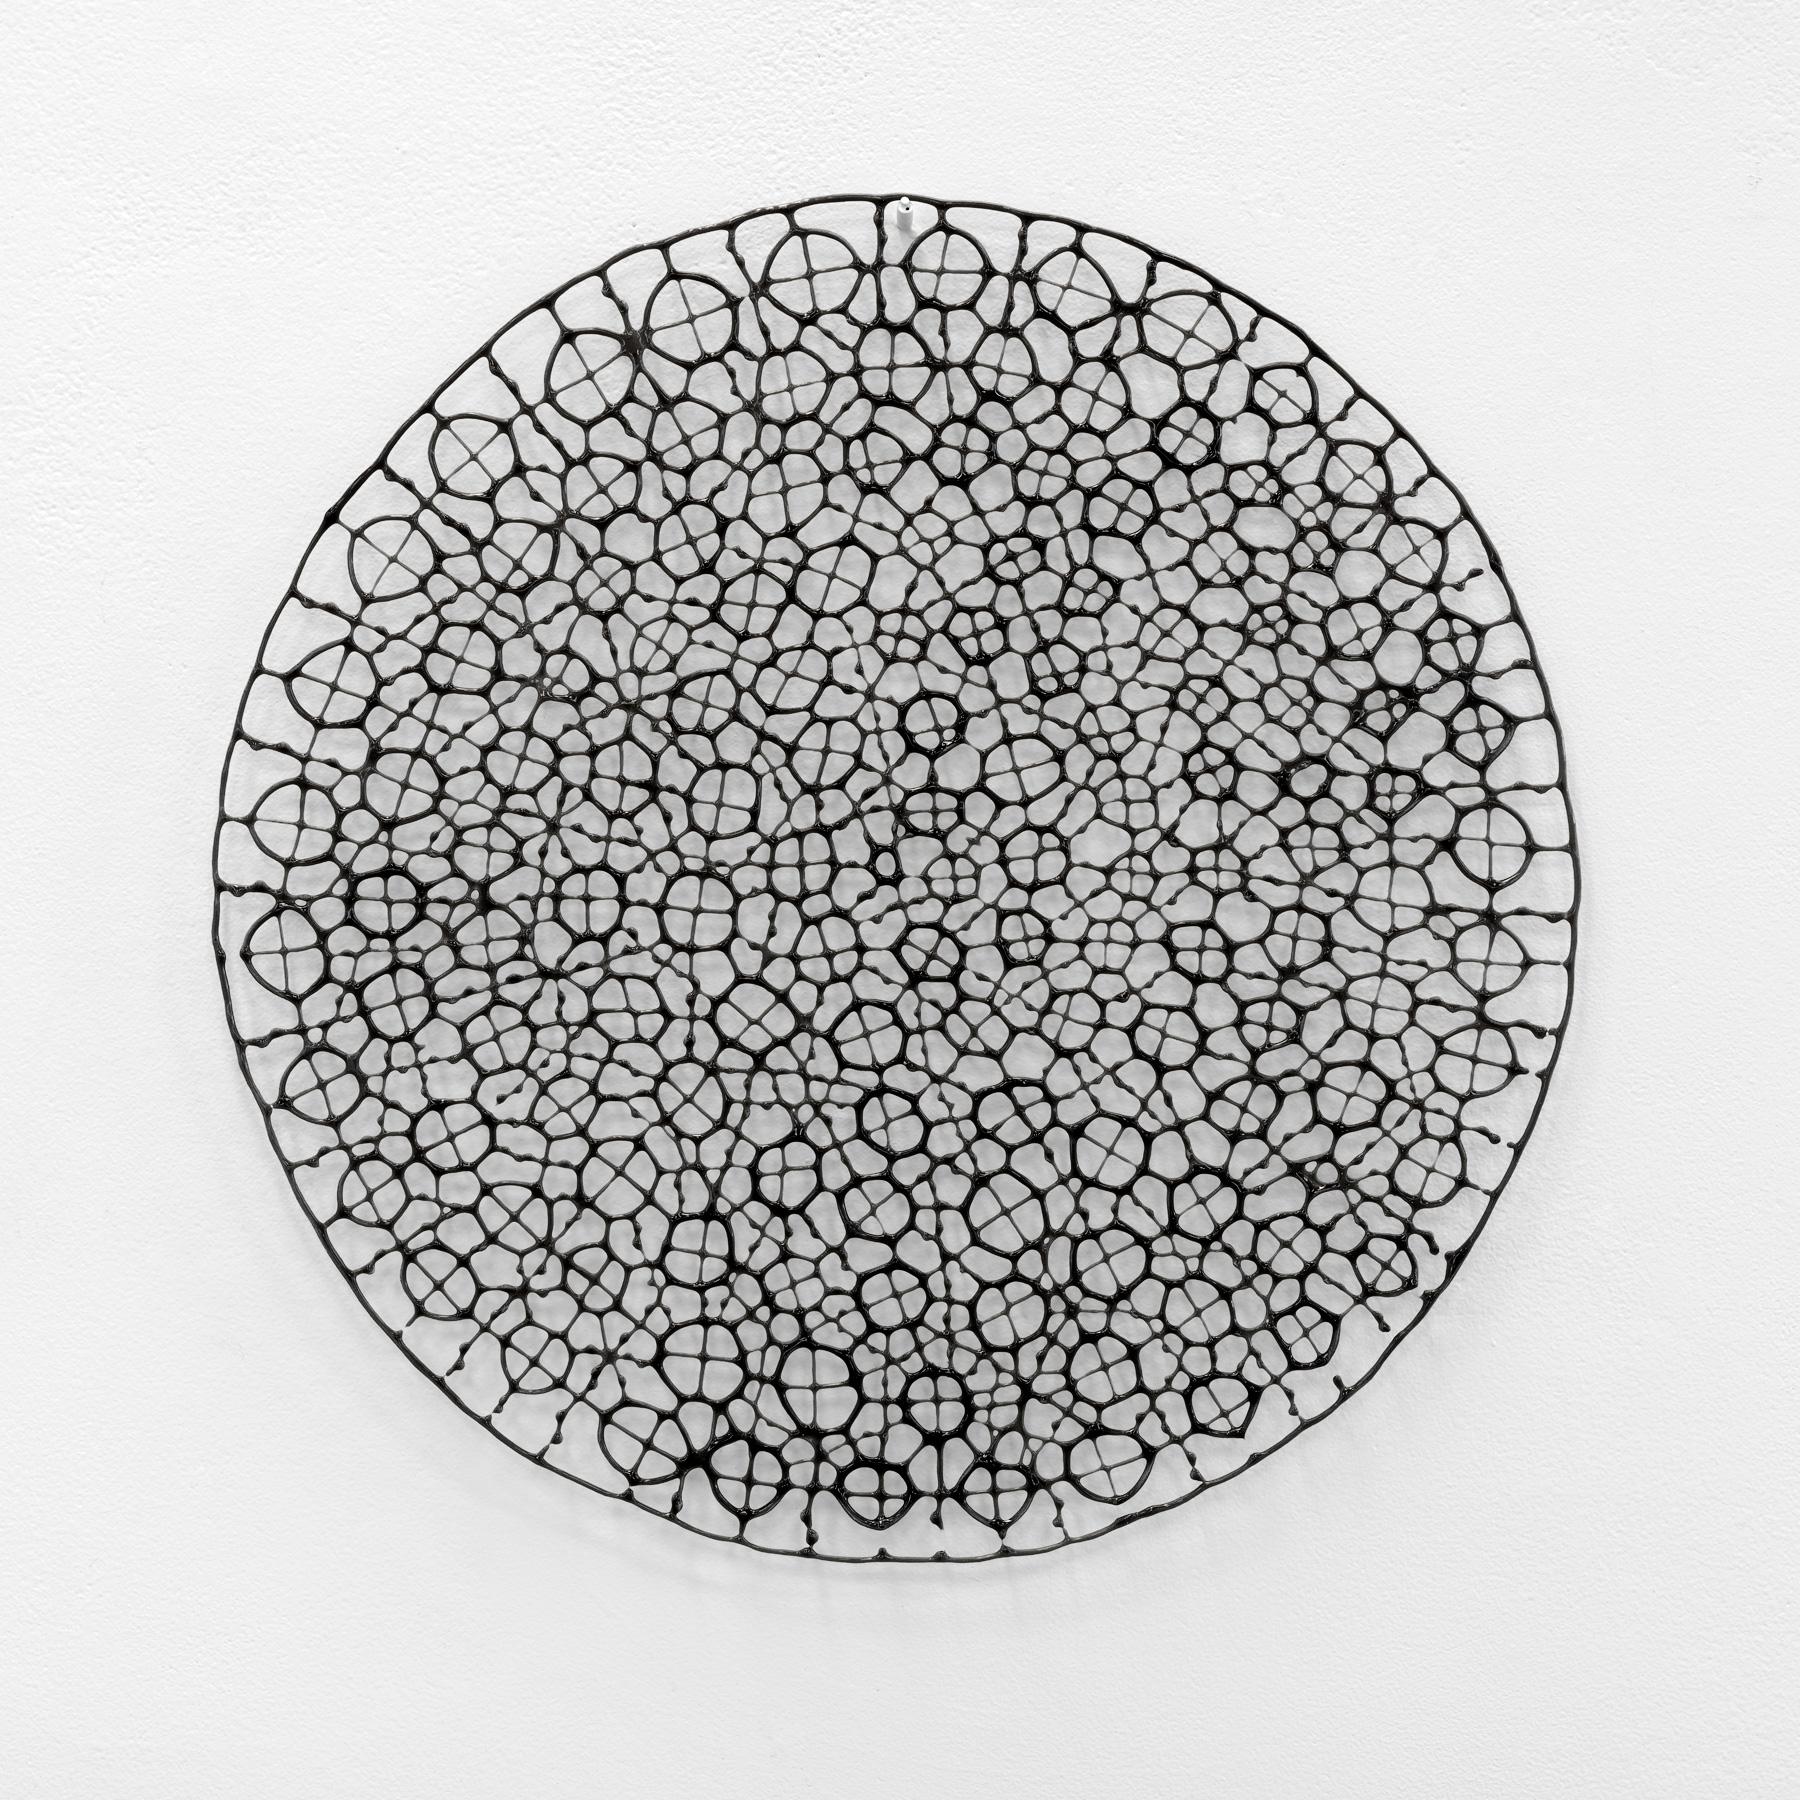 Ursula Halpin, An lub ar lár series (the dropped stitch series), 2016, pâte de verre, kiln formed bullseye glass, 40x40cm, photo by Grant Hancock